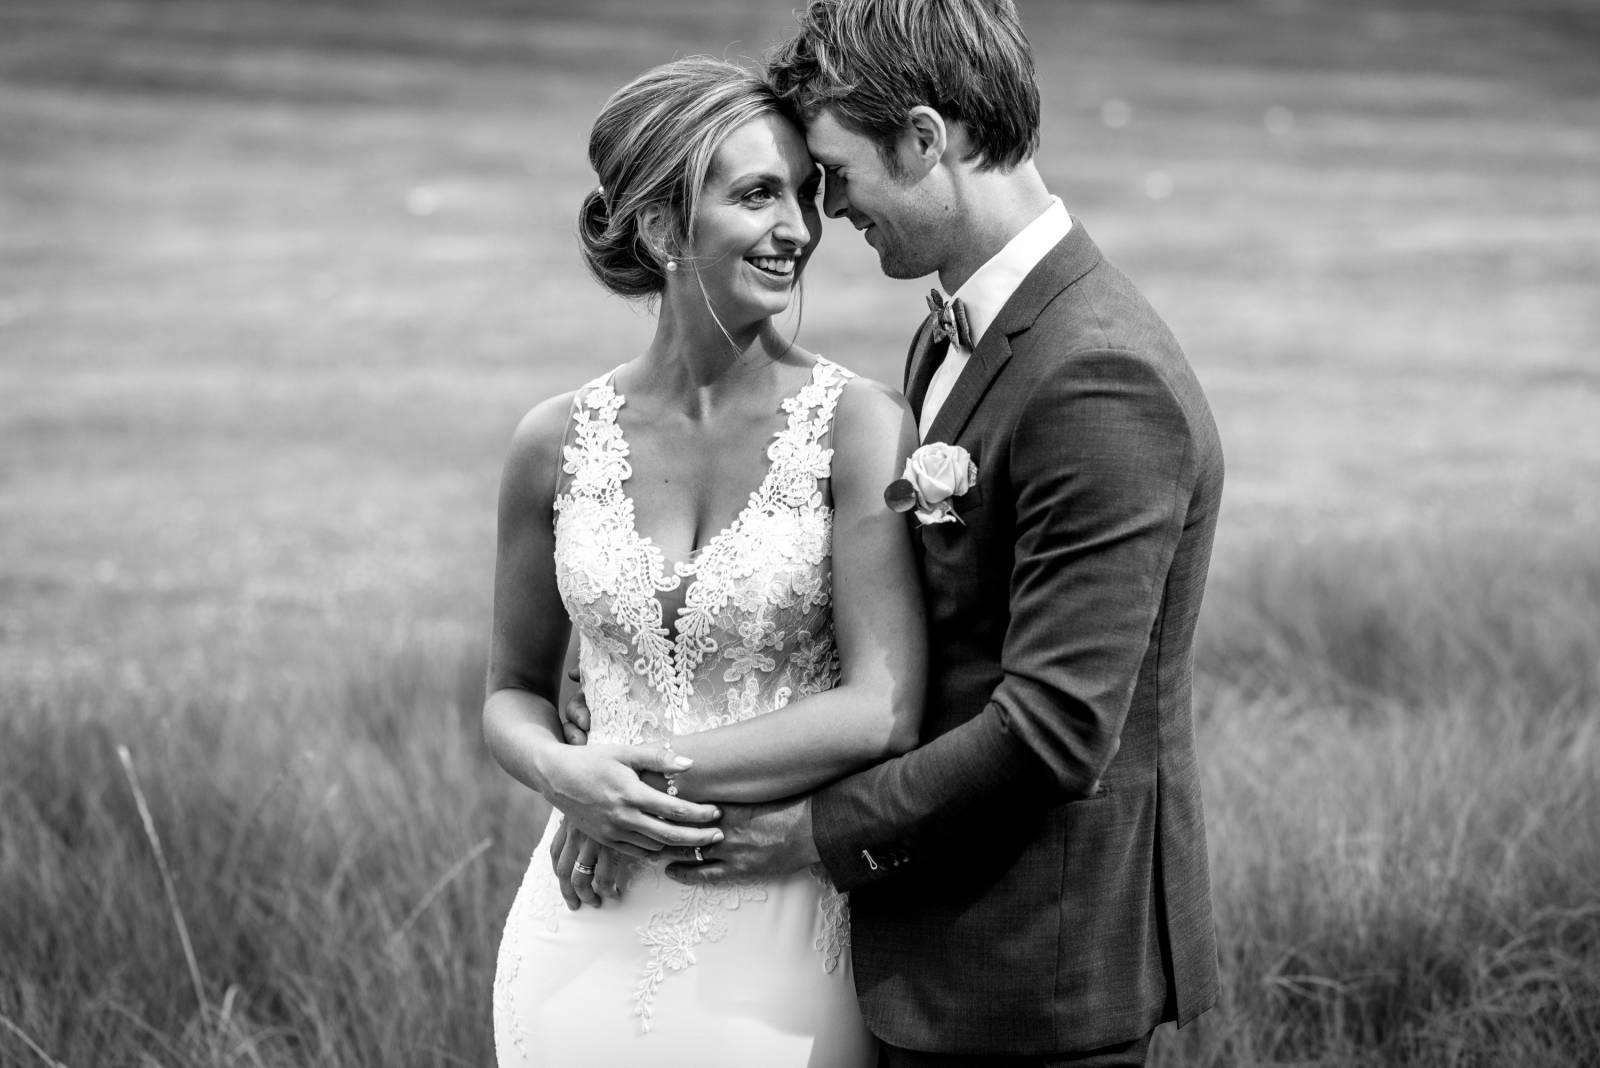 Fotografie Melody - Huwelijksfotograaf - Trouwfotograaf - House of Weddings - 4